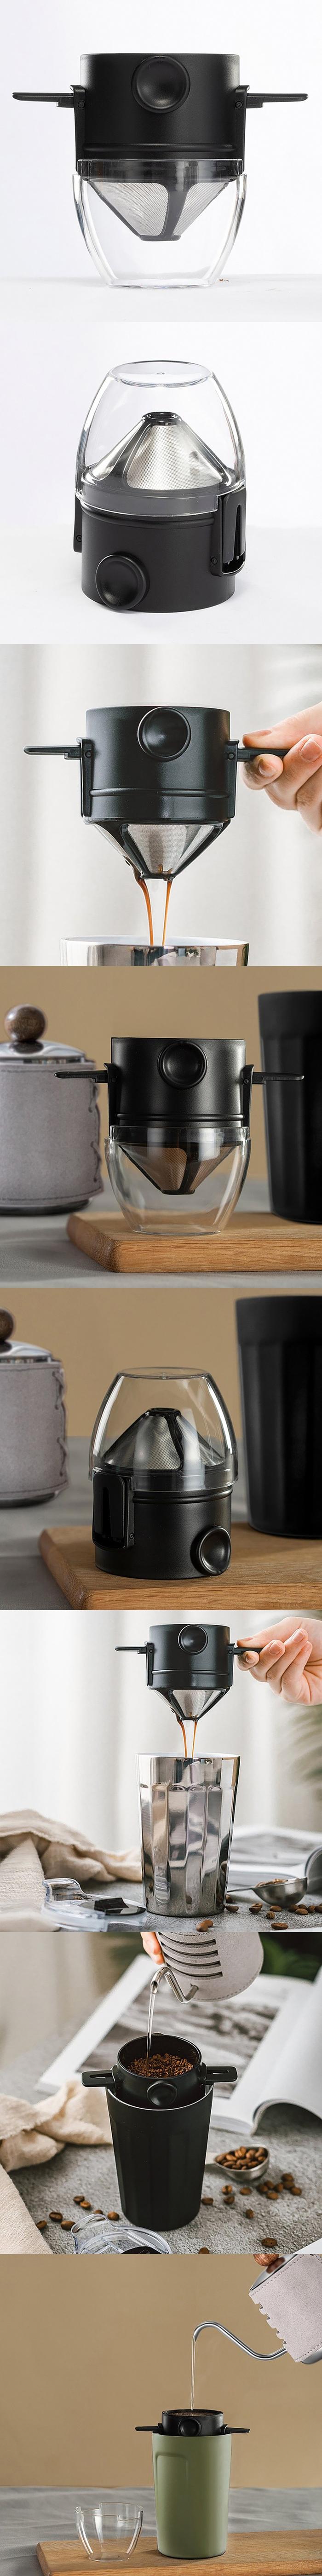 PO:Selected|丹麥棱角保溫杯咖啡三件組(棱角保溫杯-黑/咖啡磨2.0/咖啡濾網)